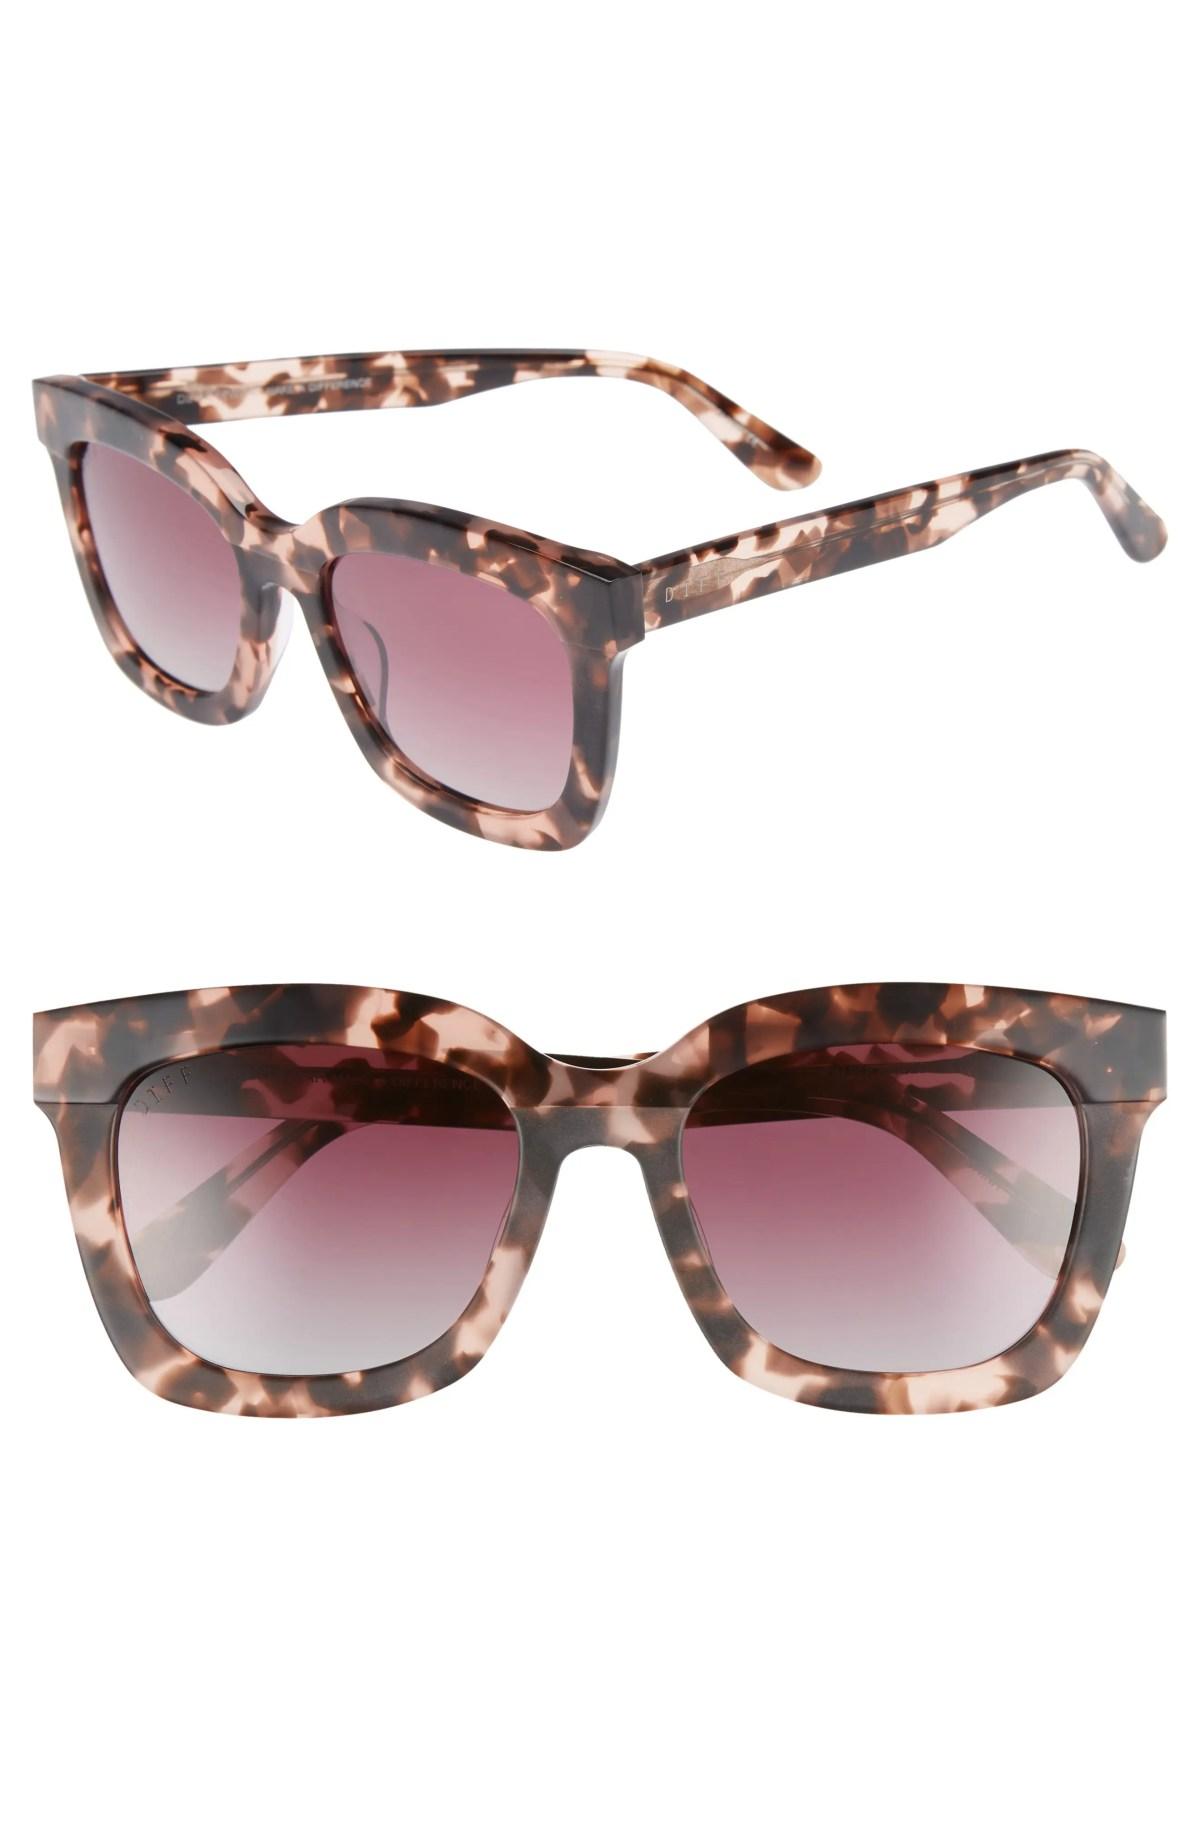 DIFF Carson 53mm Polarized Square Sunglasses, Main, color, HIMALAYAN TORTOISE/ ROSE